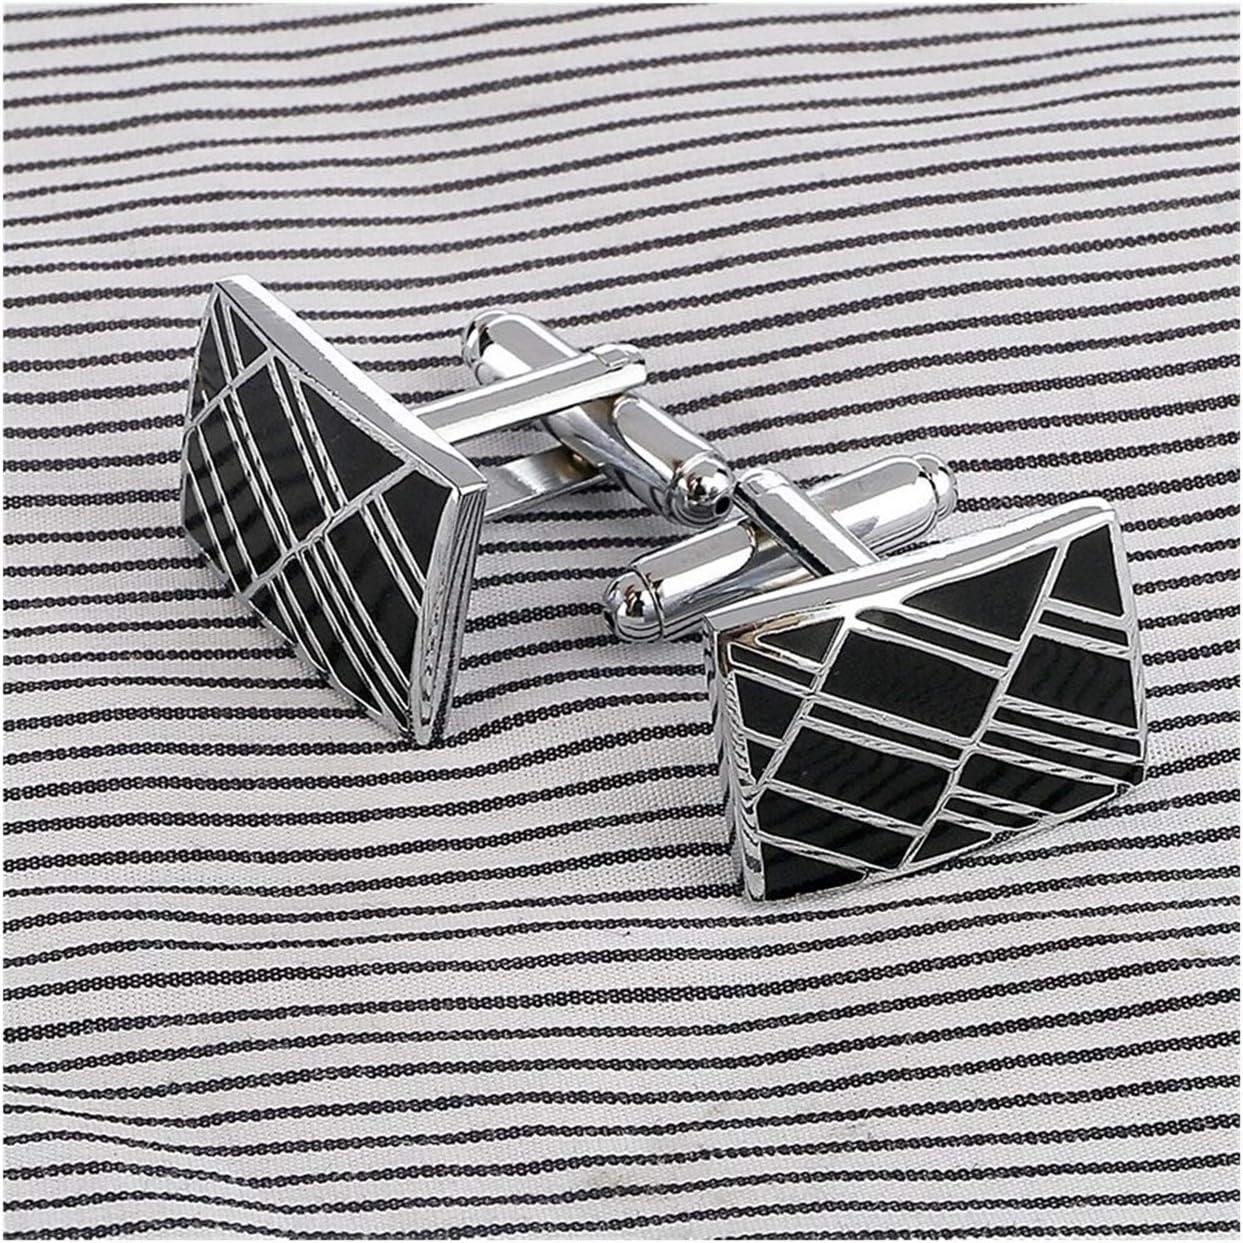 WAZG SYBLD Men's Shirt Cufflinks